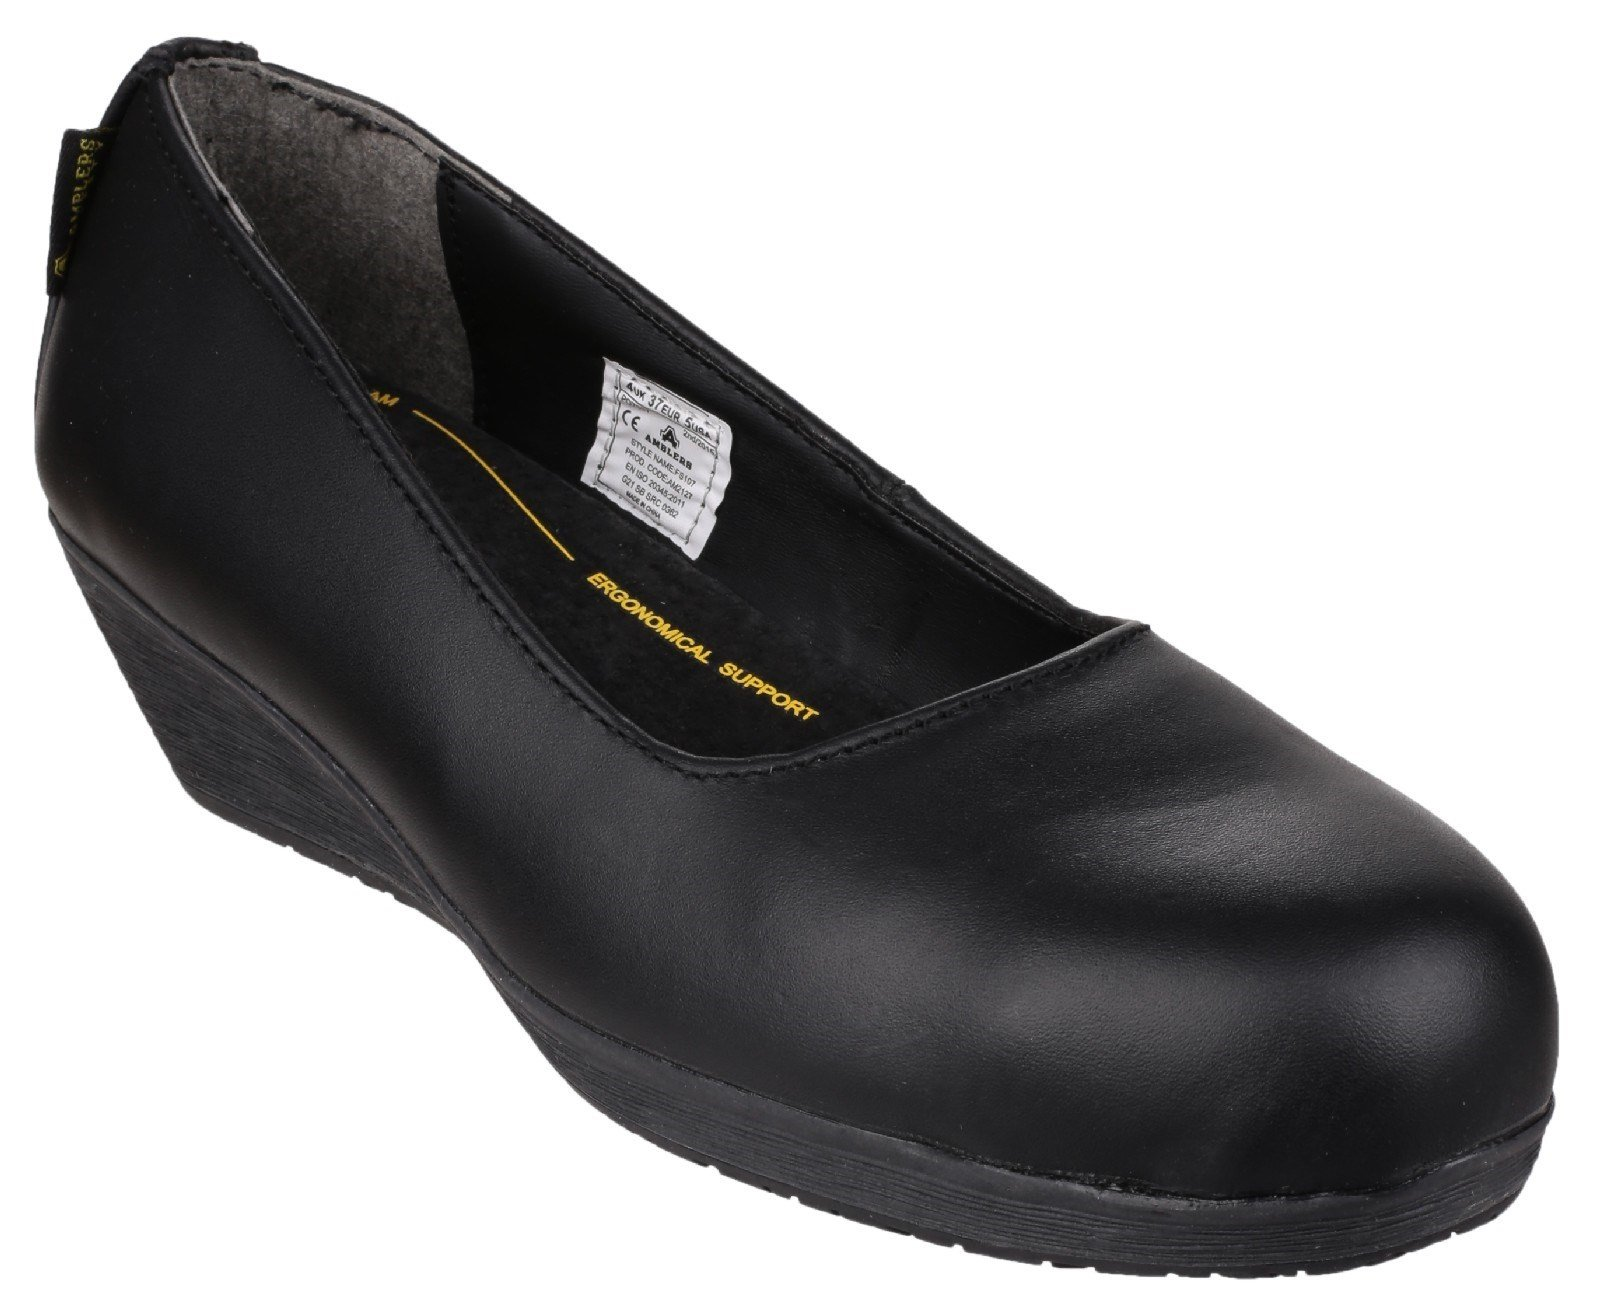 Amblers Women's Safety Antibacterial Memory Foam Slip on Shoe Black 21555 - Black 3